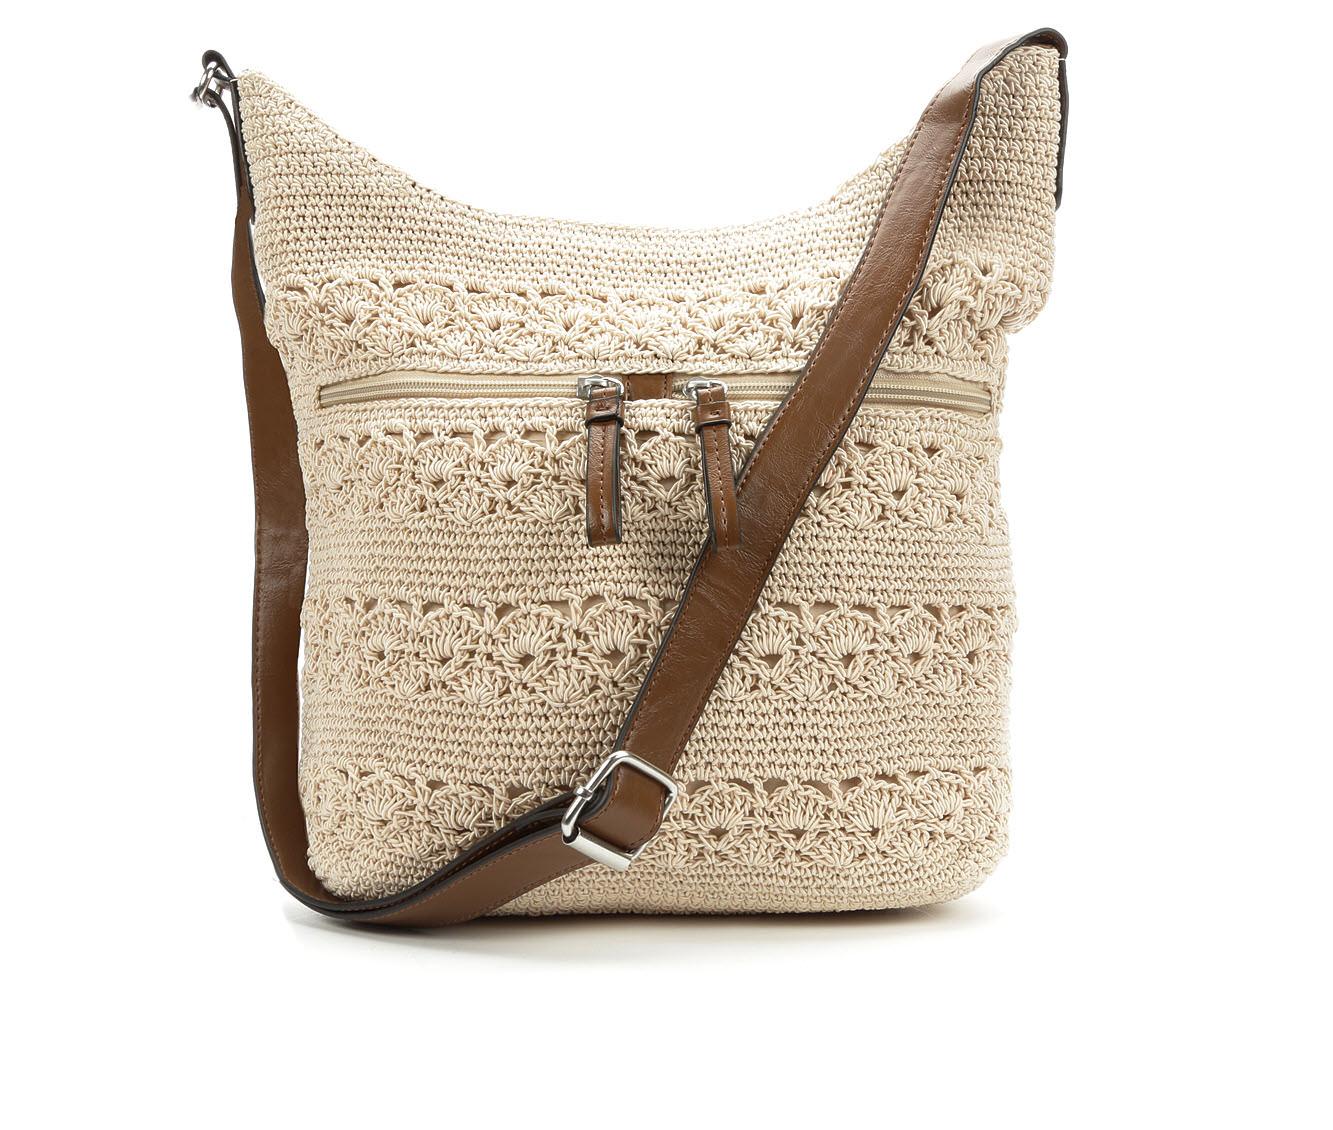 Bueno Of California Rayon Crochet Crossbody (Beige)